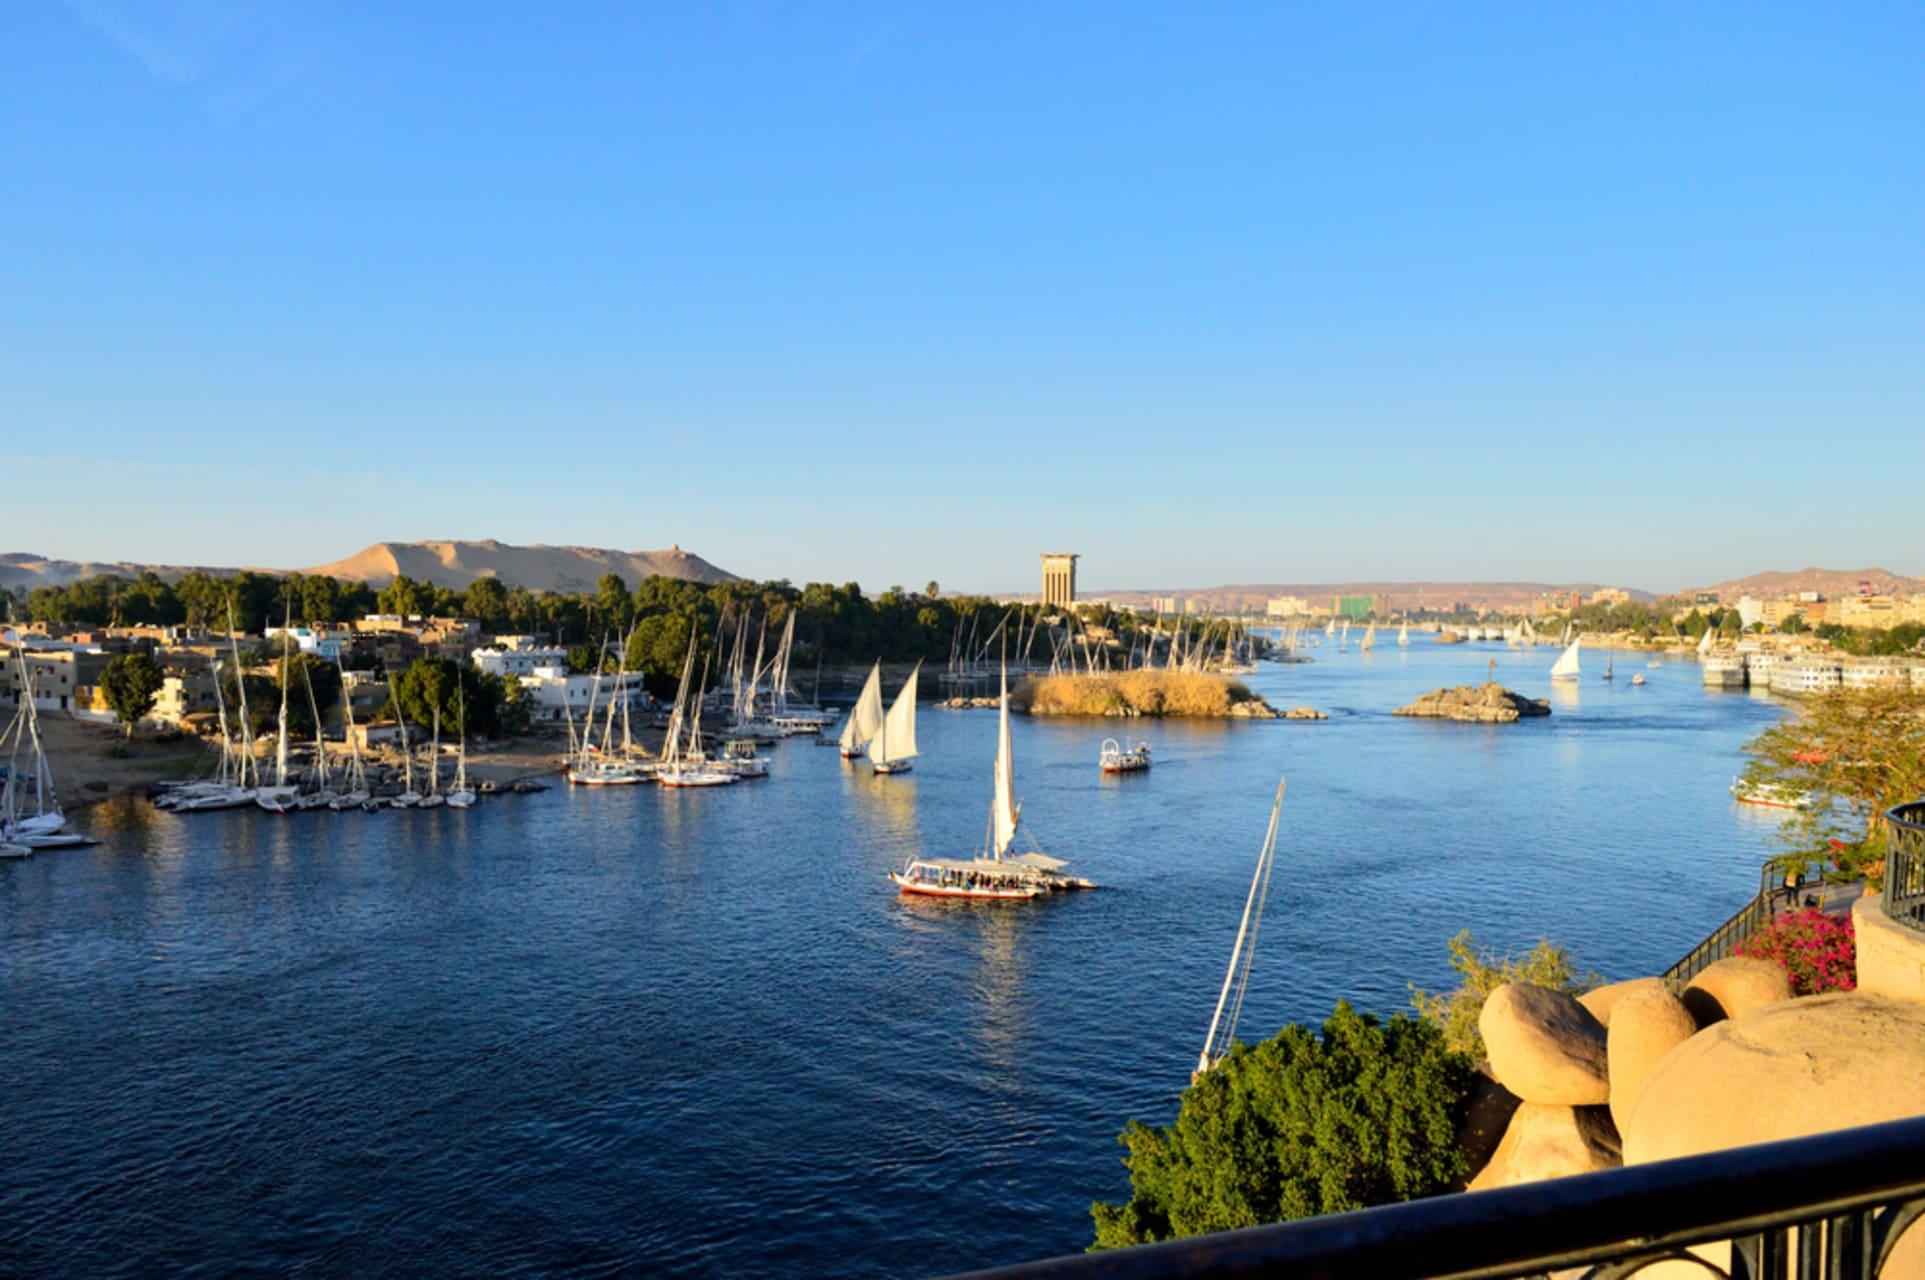 Aswan - Sailing The Nile